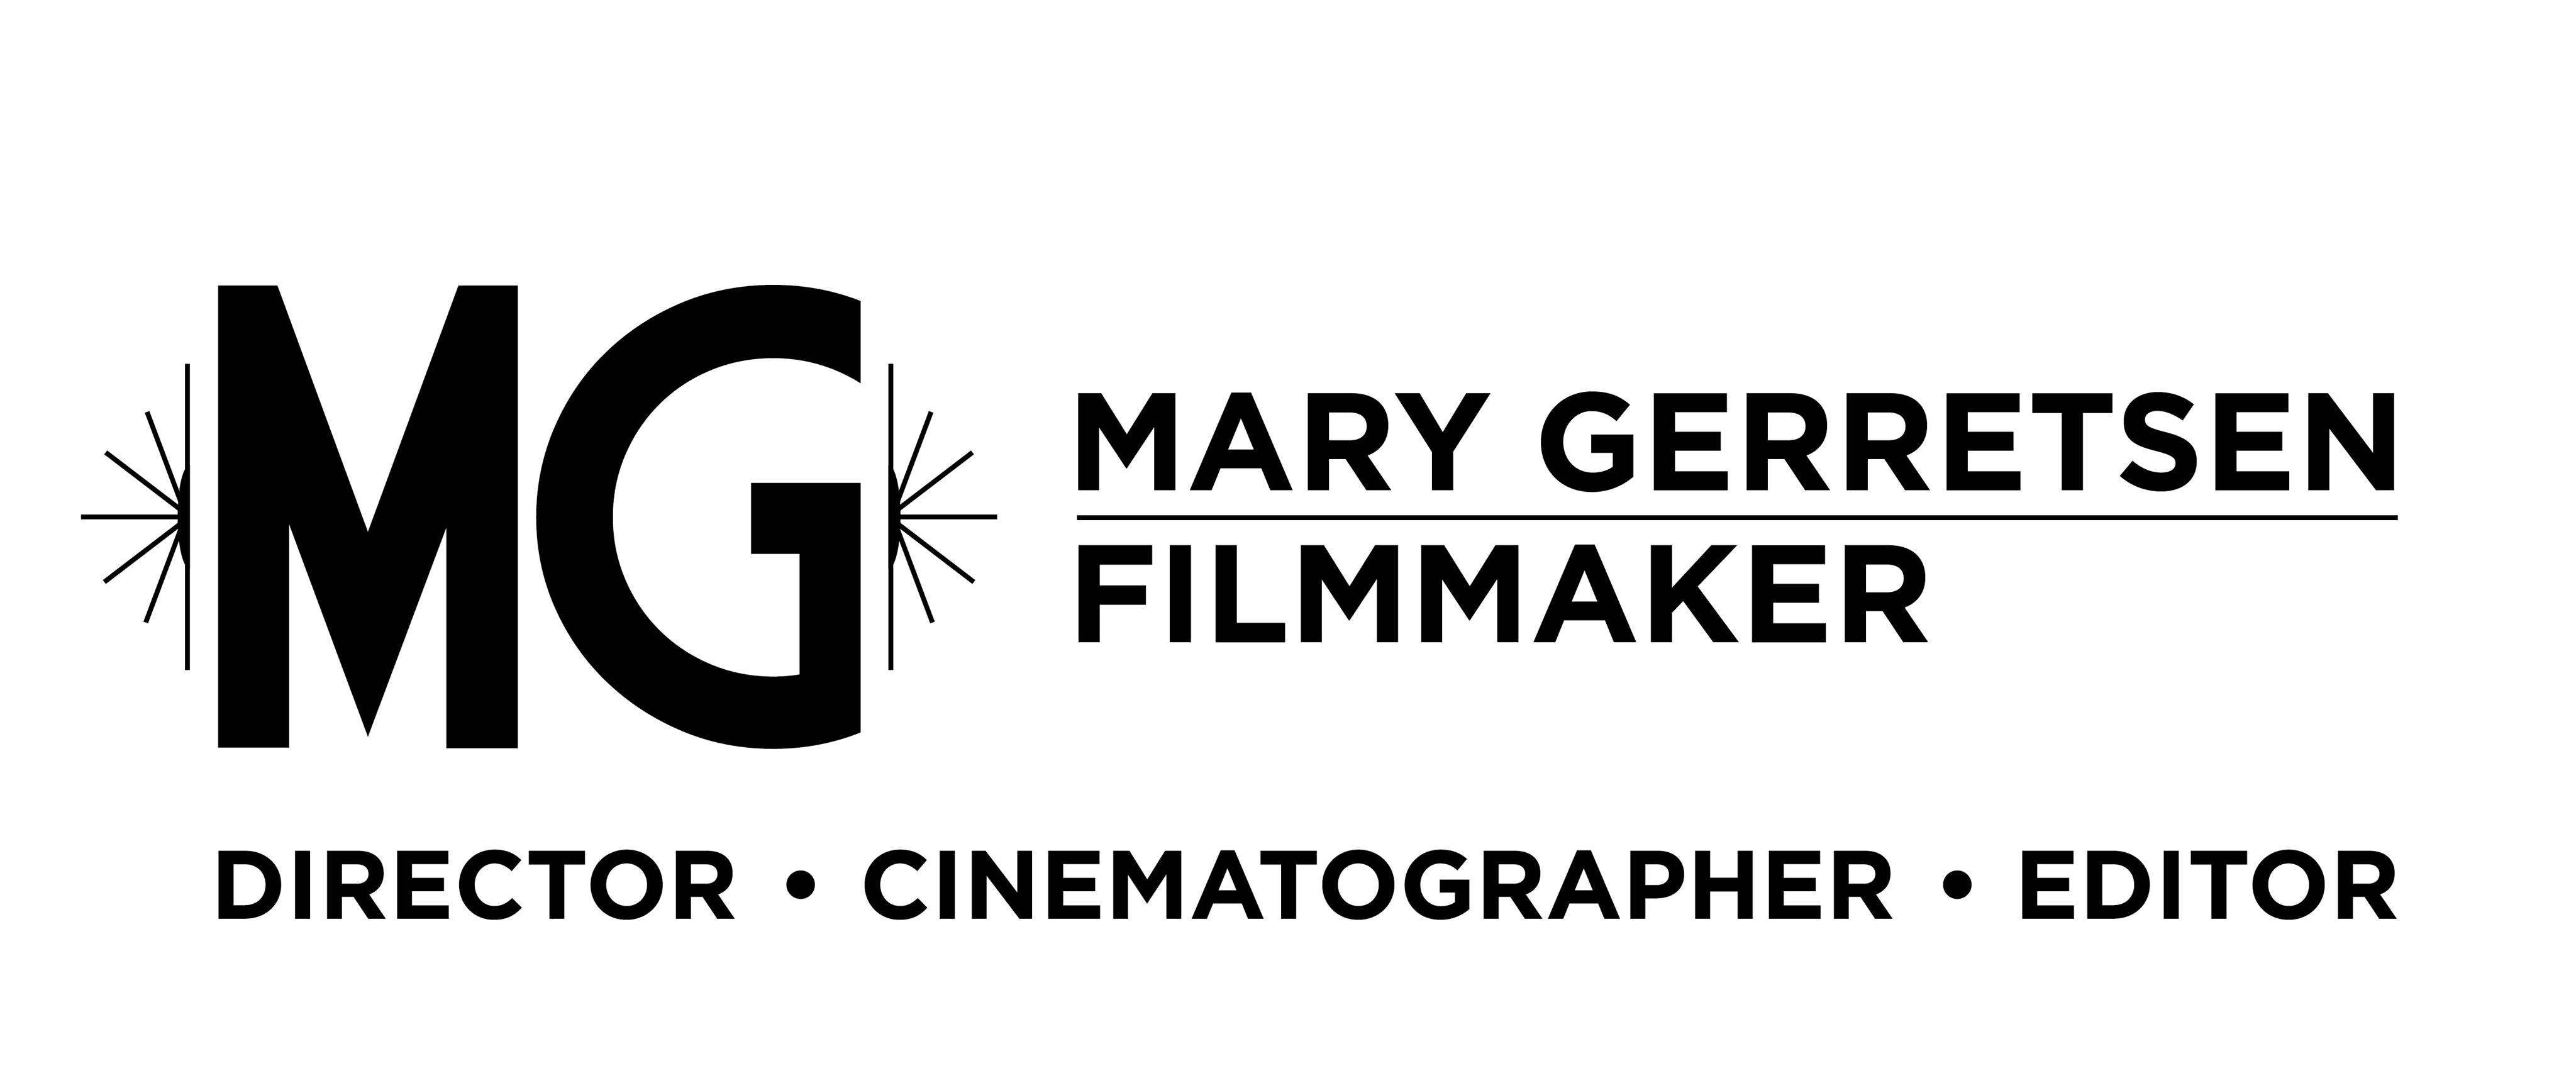 Mary Gerretsen